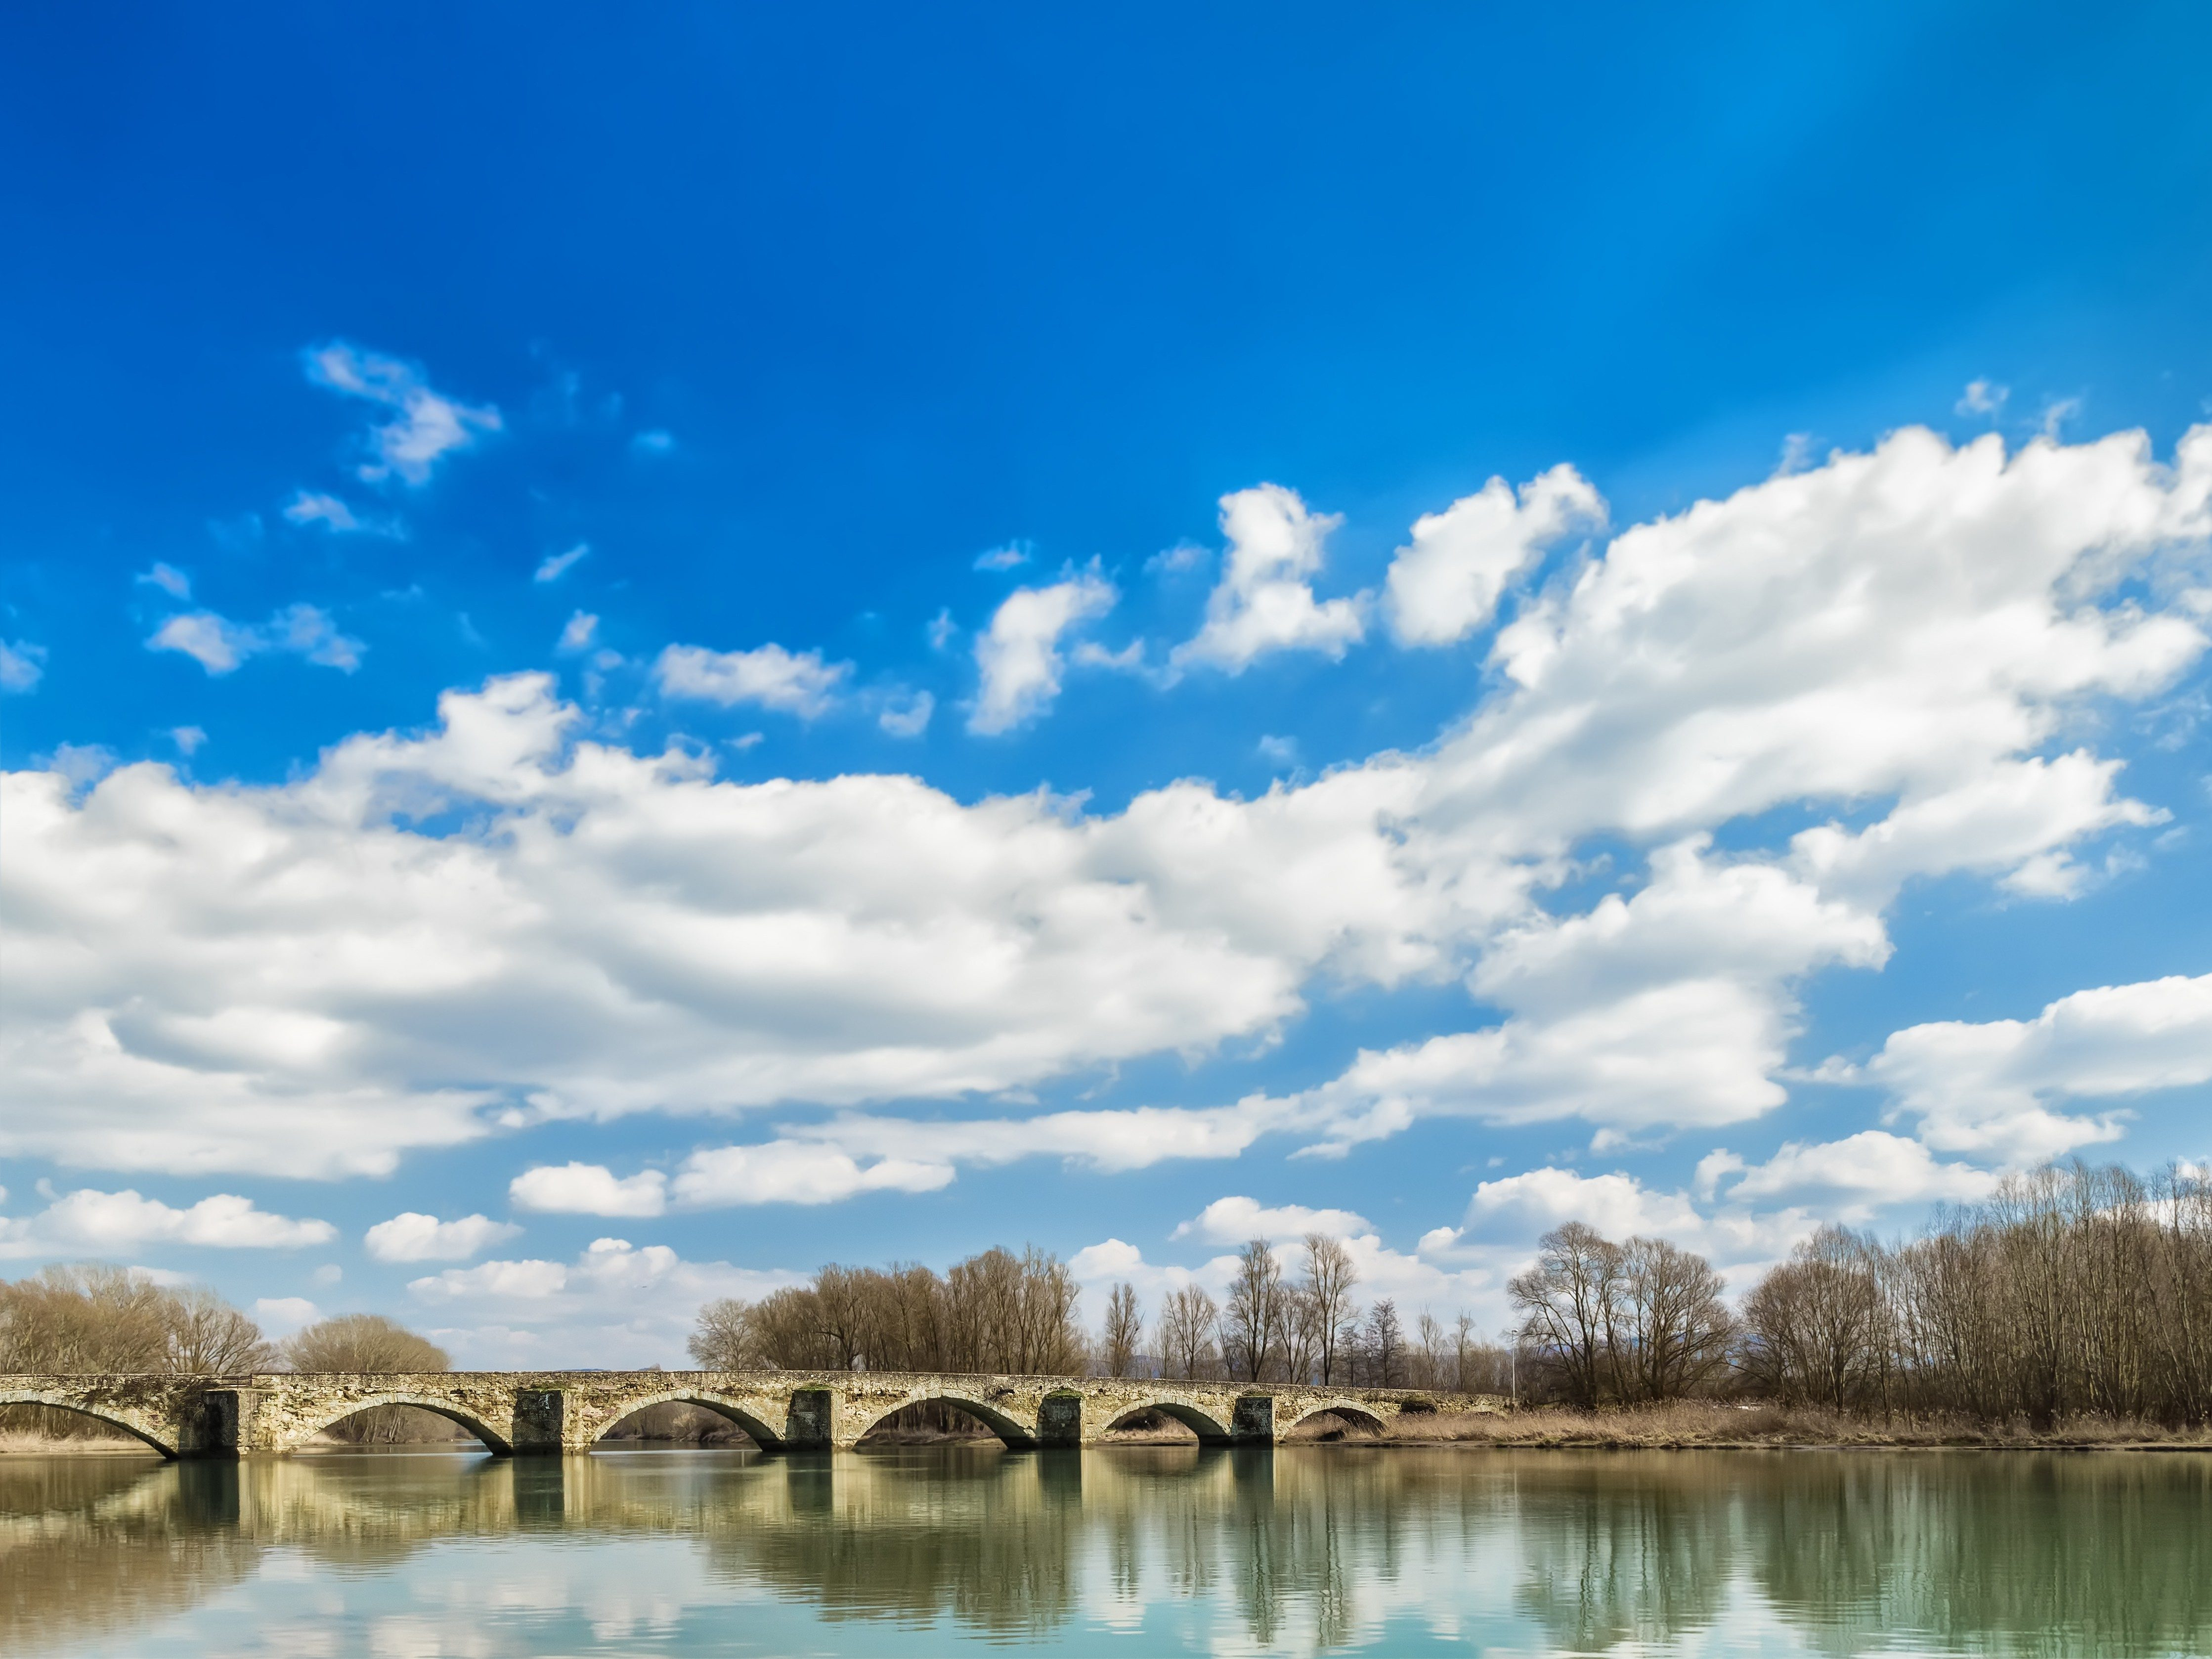 Mona Lisa mystery #5: The unknown bridge.